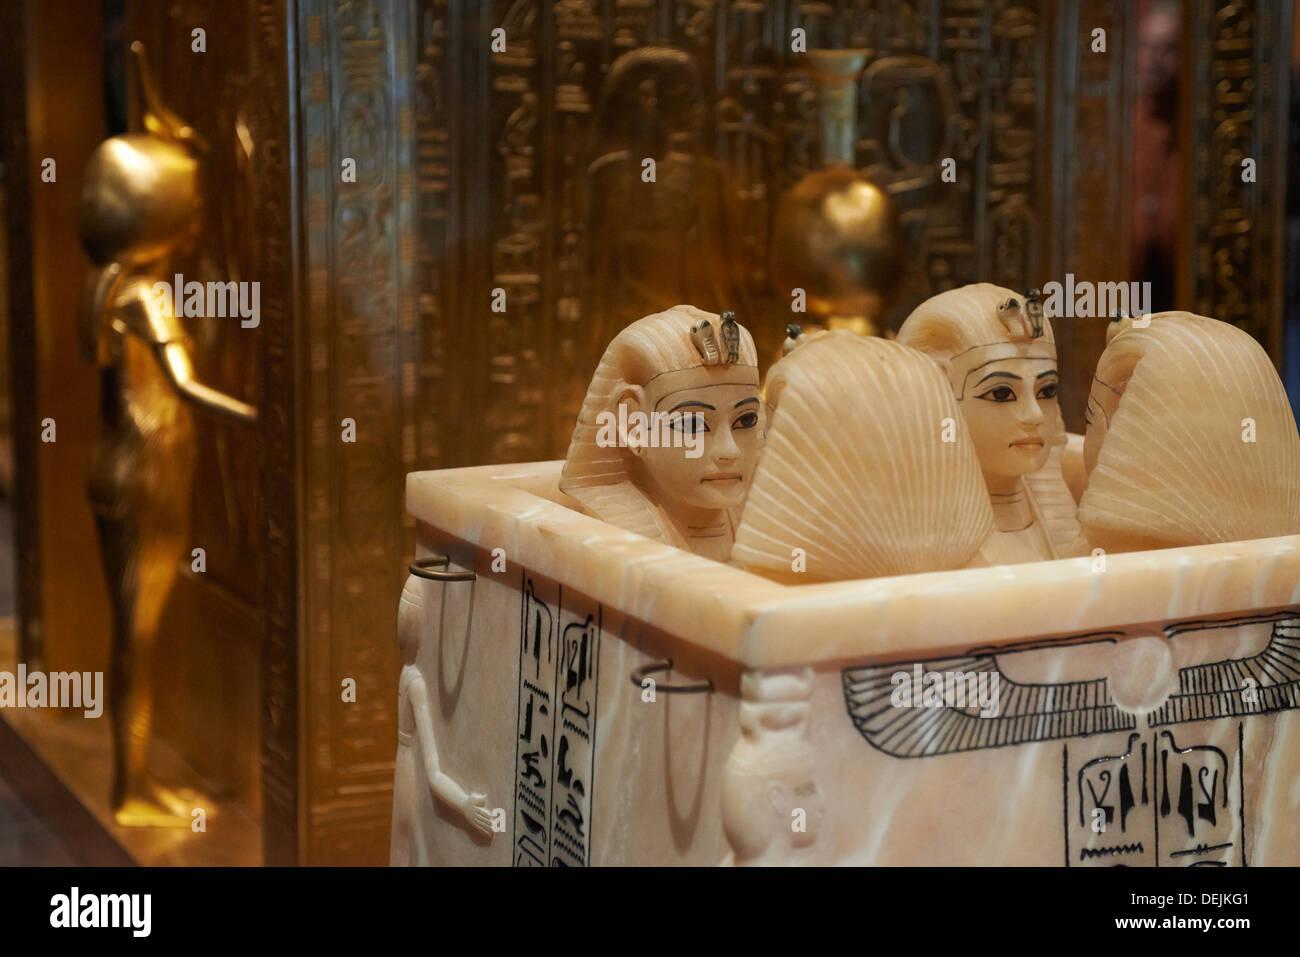 Tutankhamun - King Tut - His Tomb and his Treasures - Stock Image